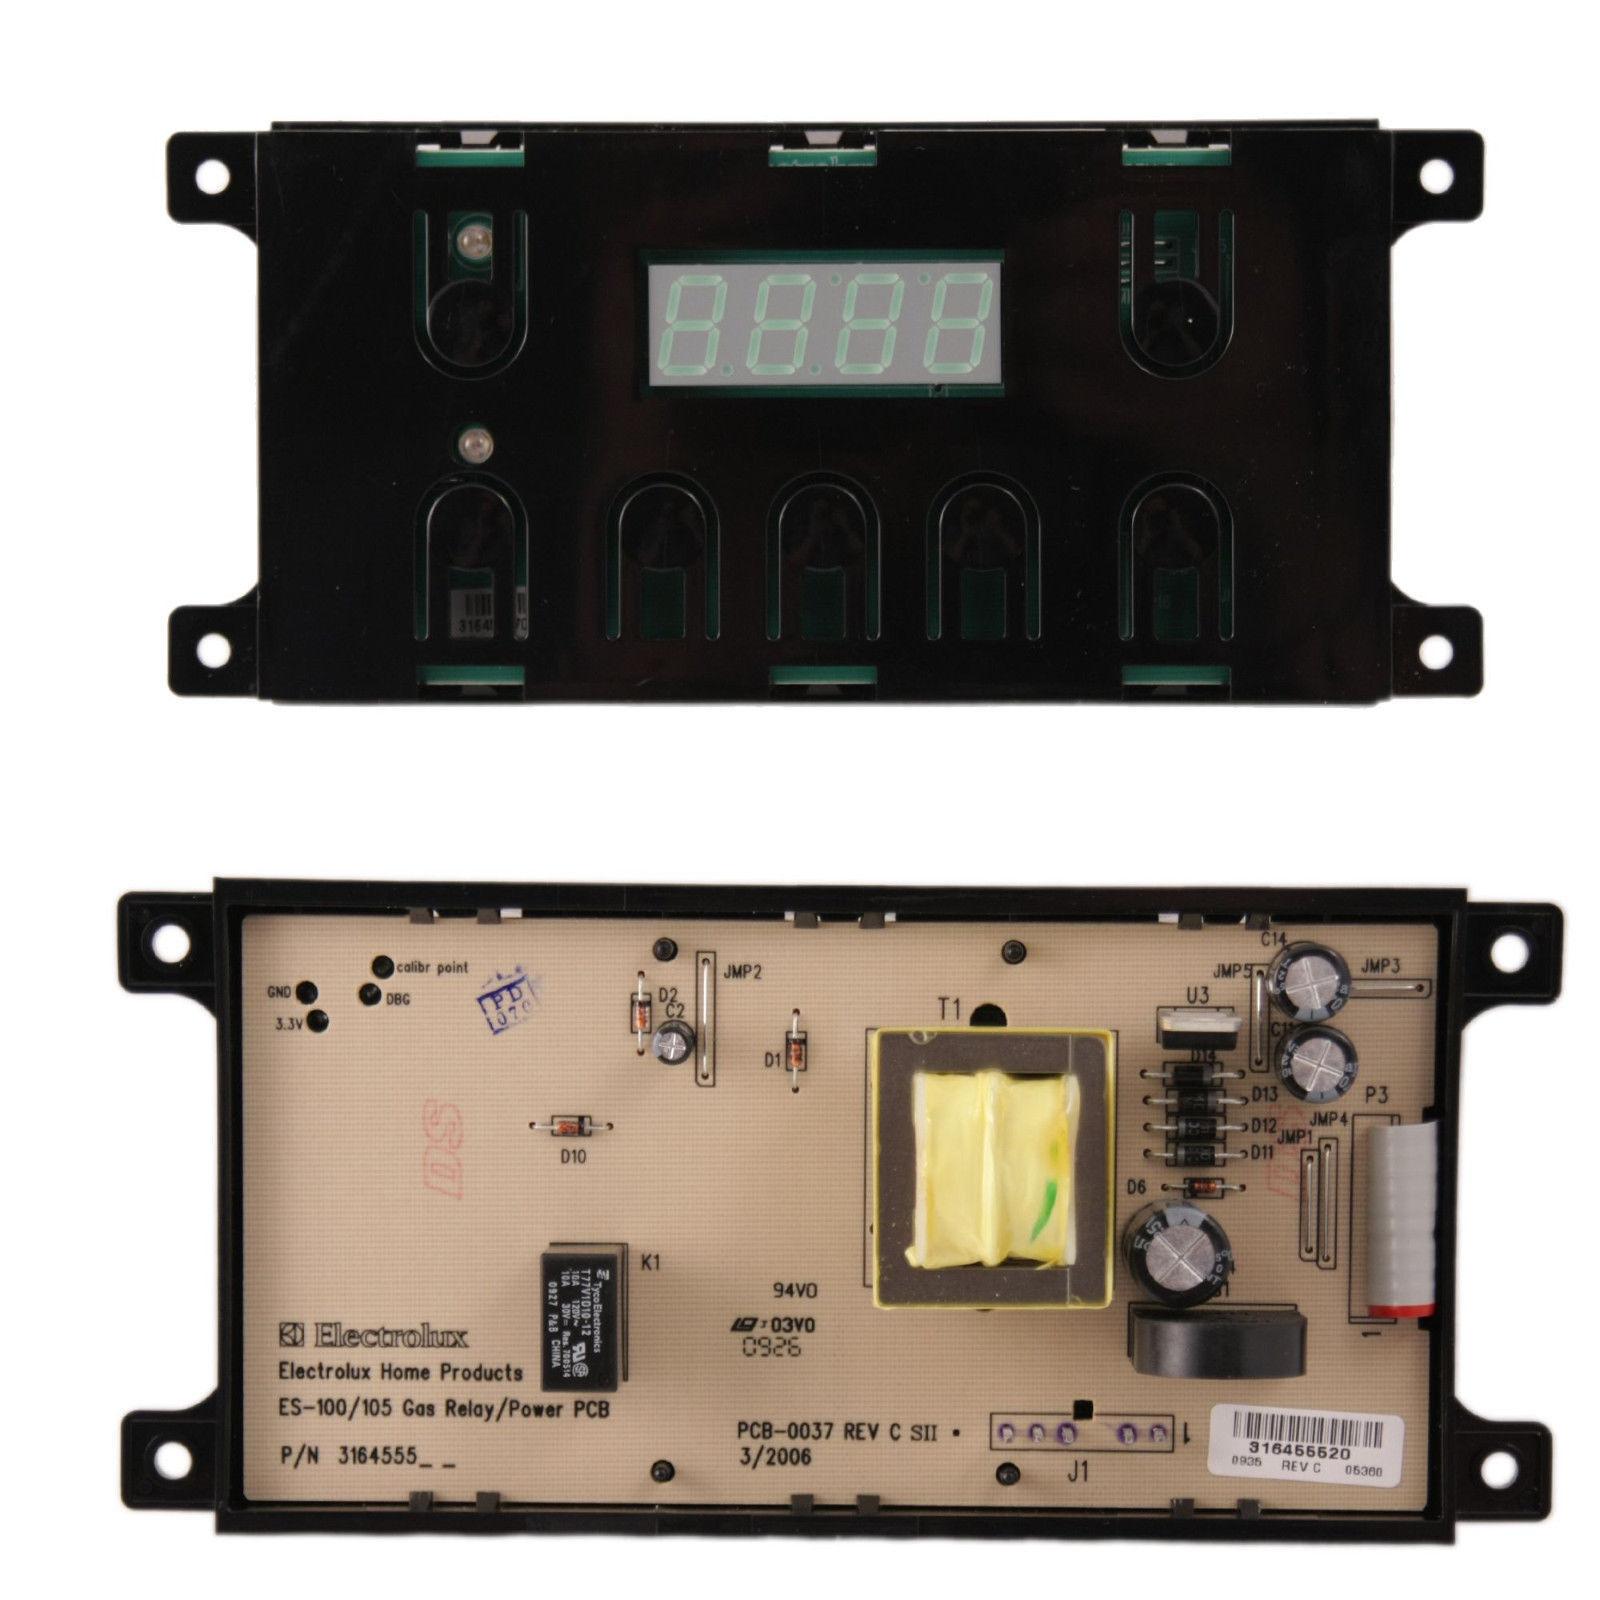 Genuine OEM Frigidaire 316455410 Oven Control Board for Gas Range 316455430